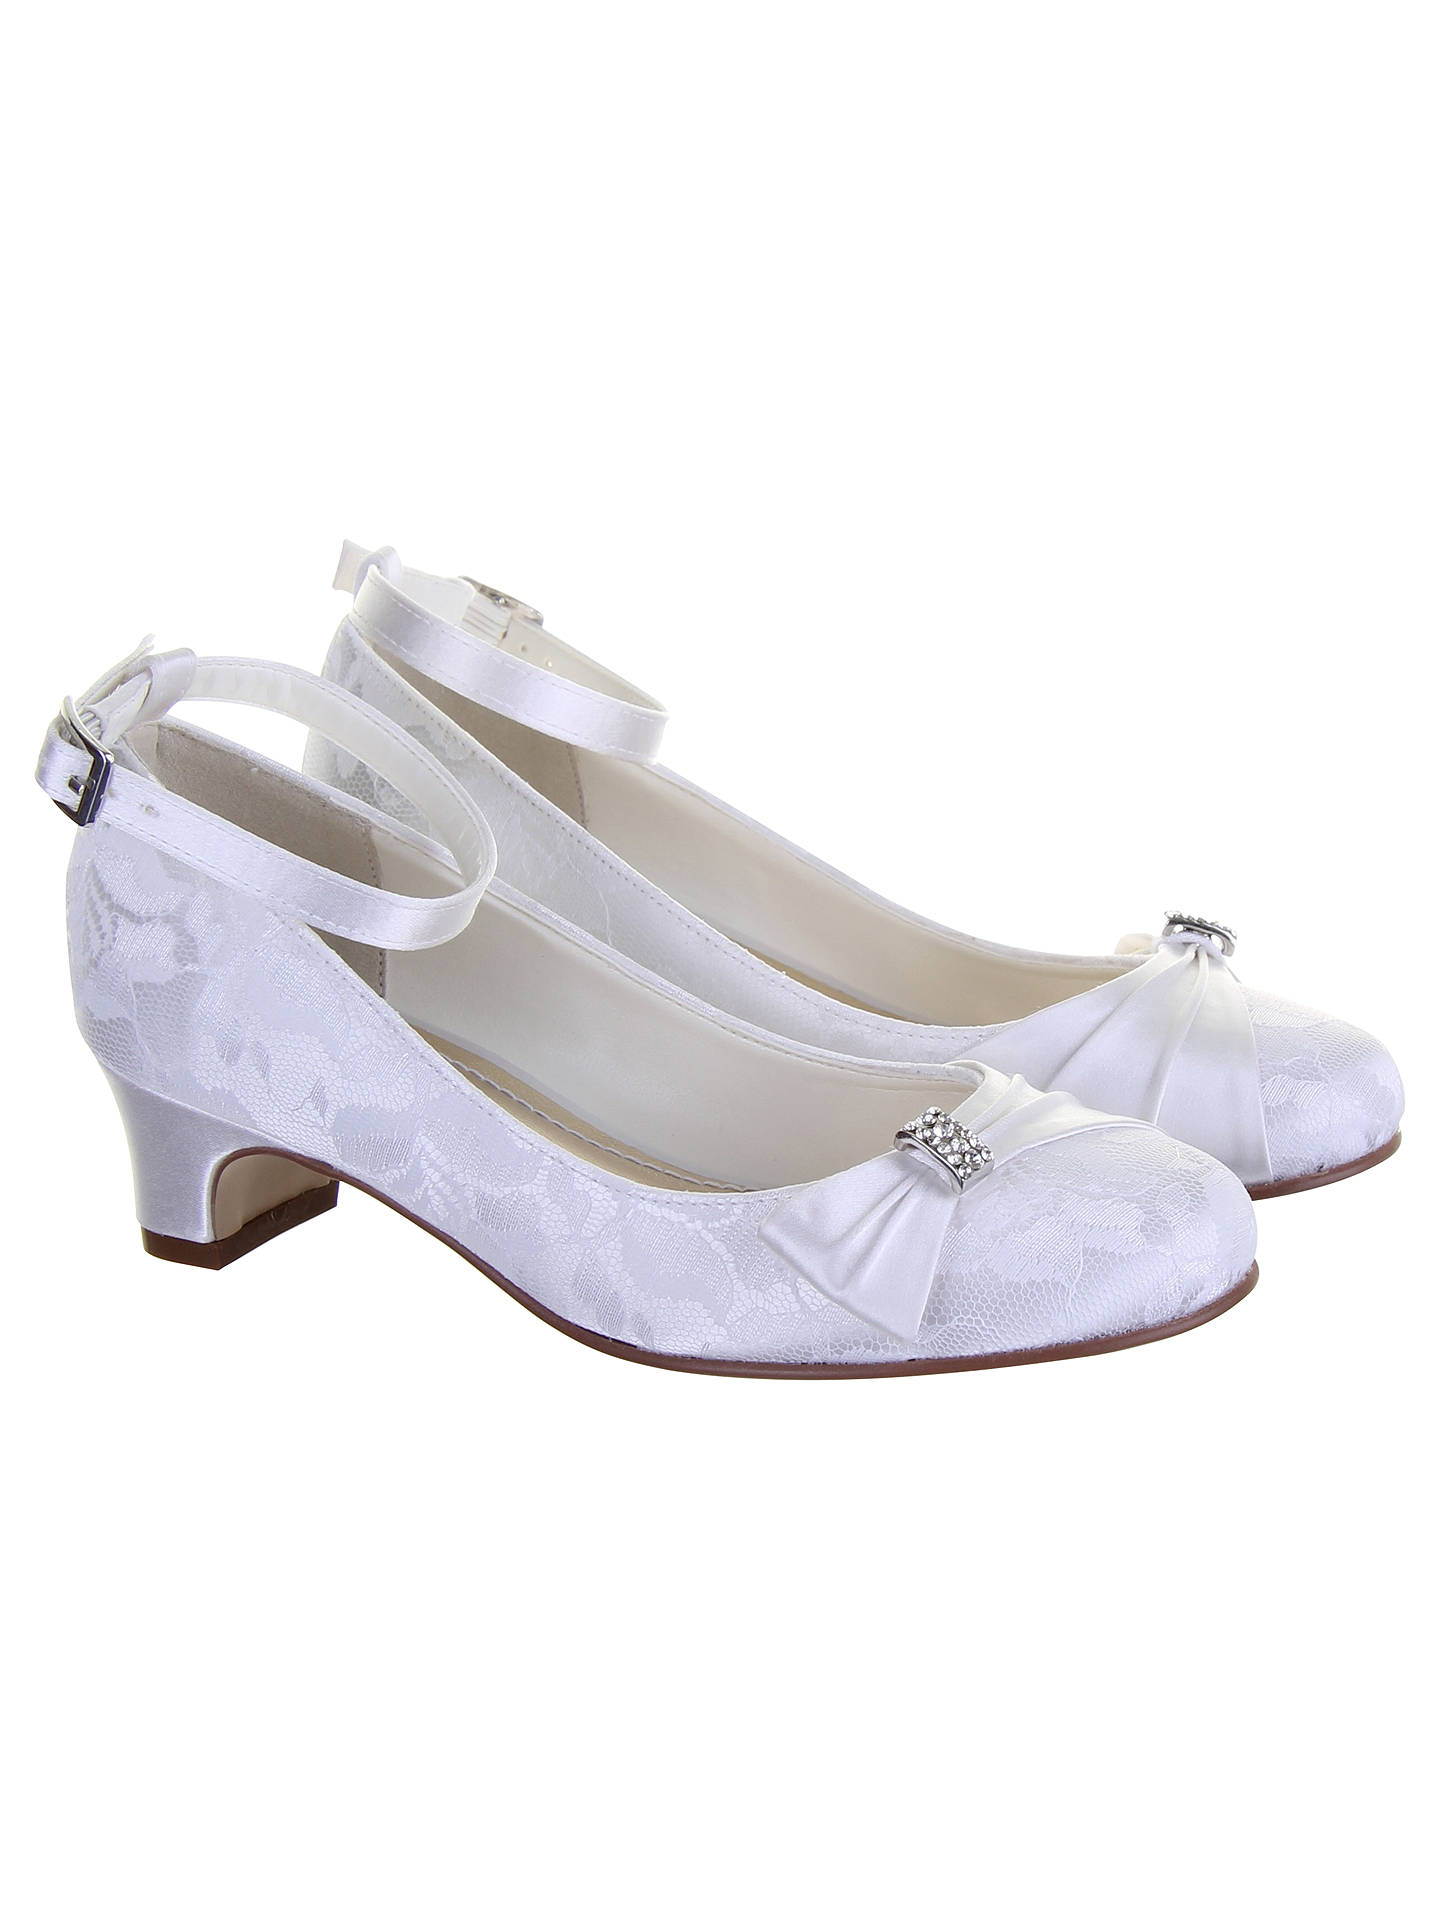 775f08e470a Rainbow Club Mint Bridesmaid Shoes, White Communion